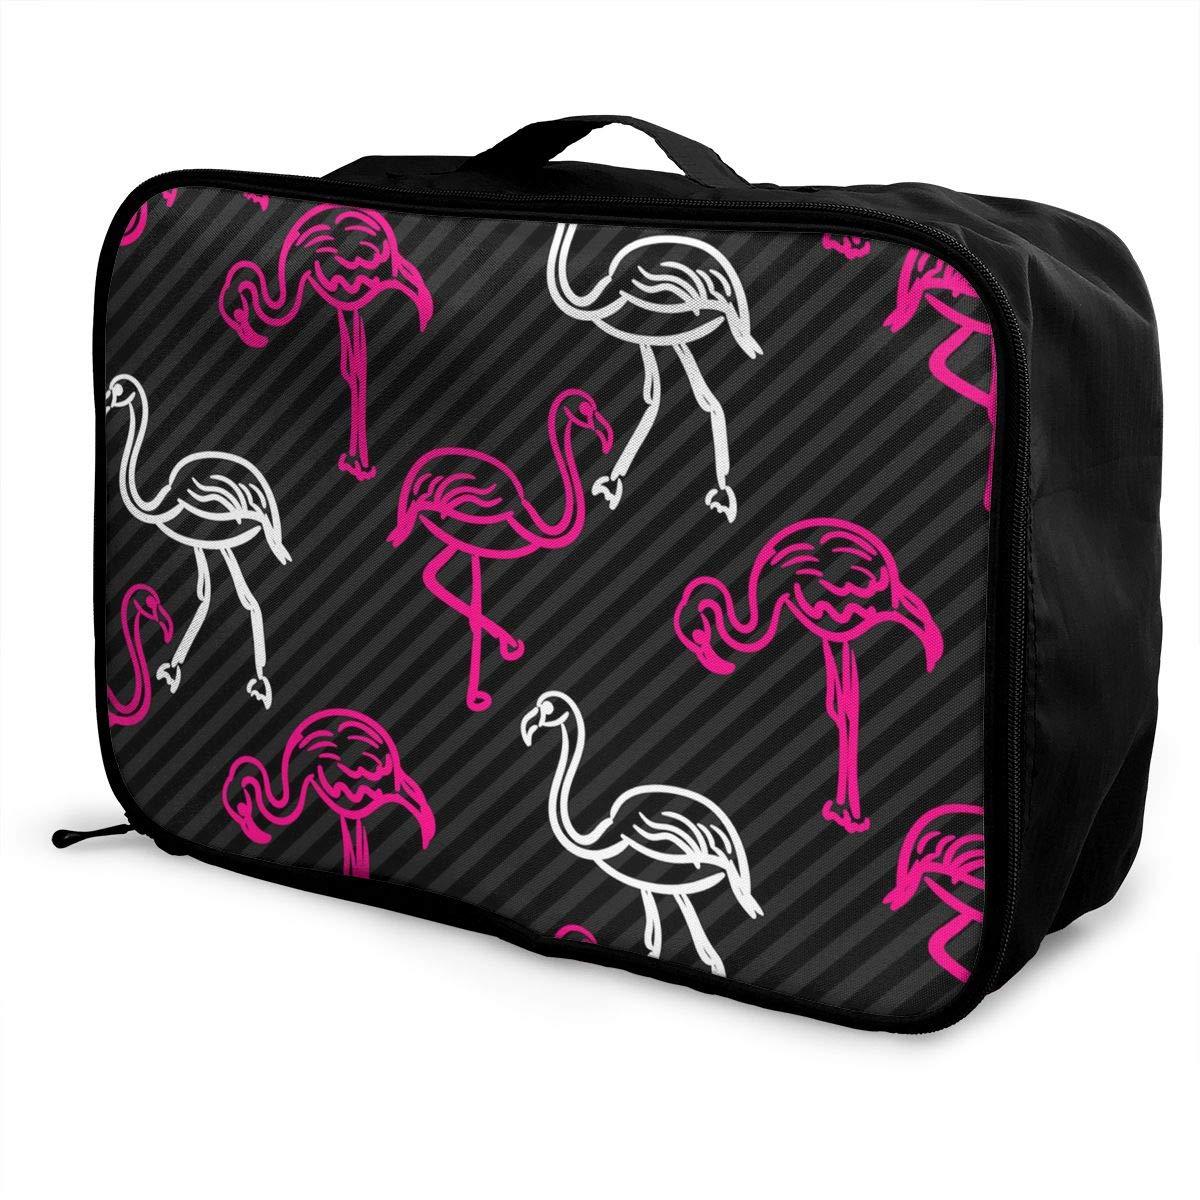 ADGAI Black and Pink Striped Flamingo Bird Canvas Travel Weekender Bag,Fashion Custom Lightweight Large Capacity Portable Luggage Bag,Suitcase Trolley Bag